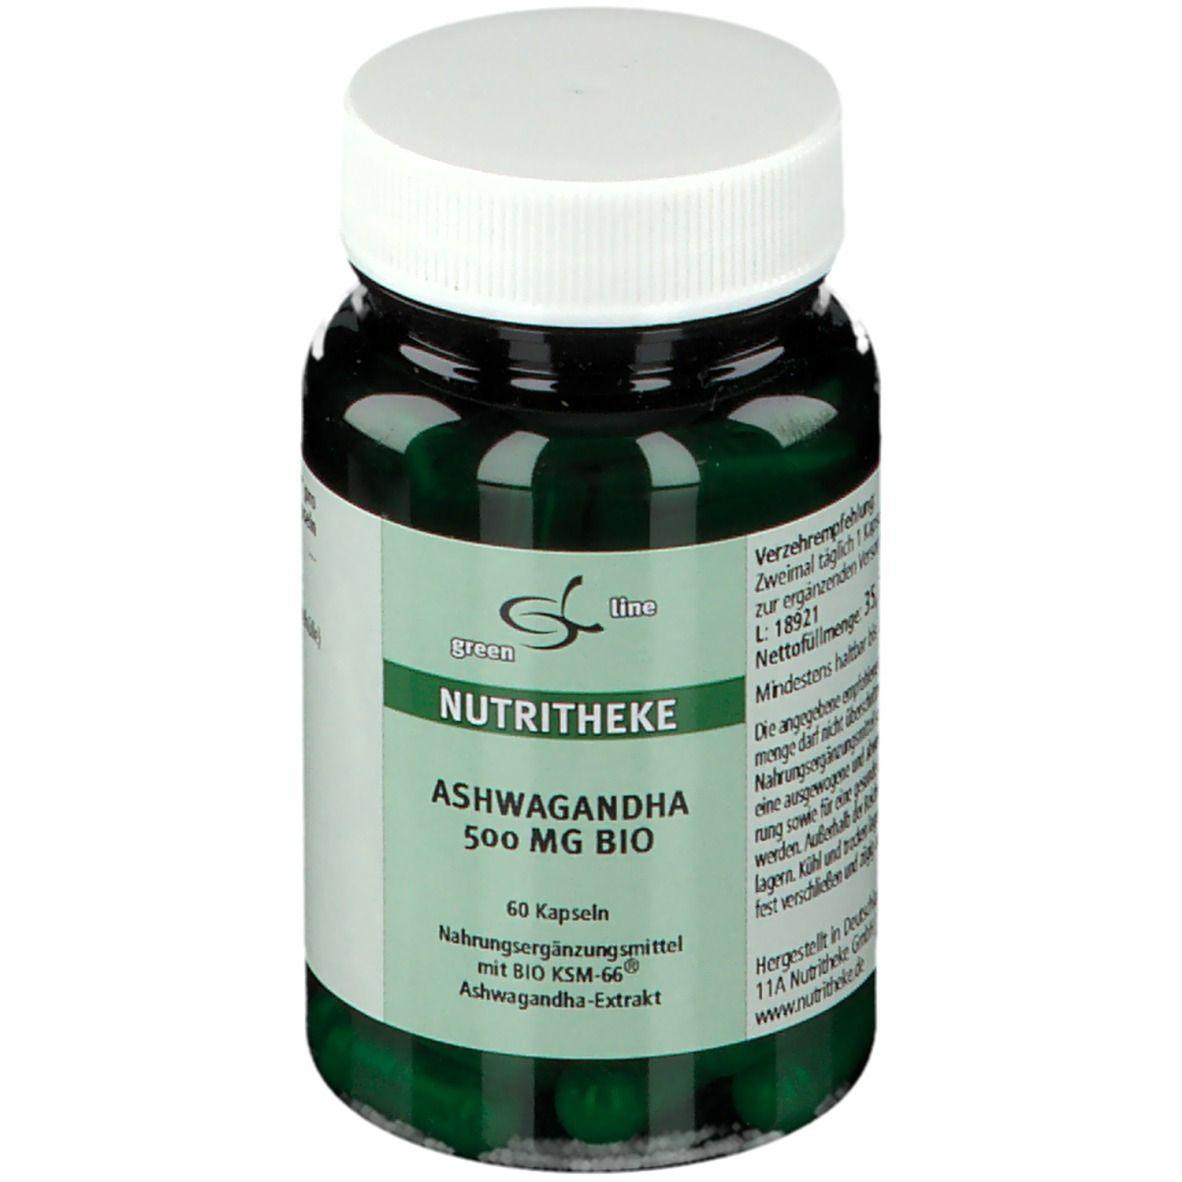 Image of green line ASHWAGANDHA 500 mg BIO